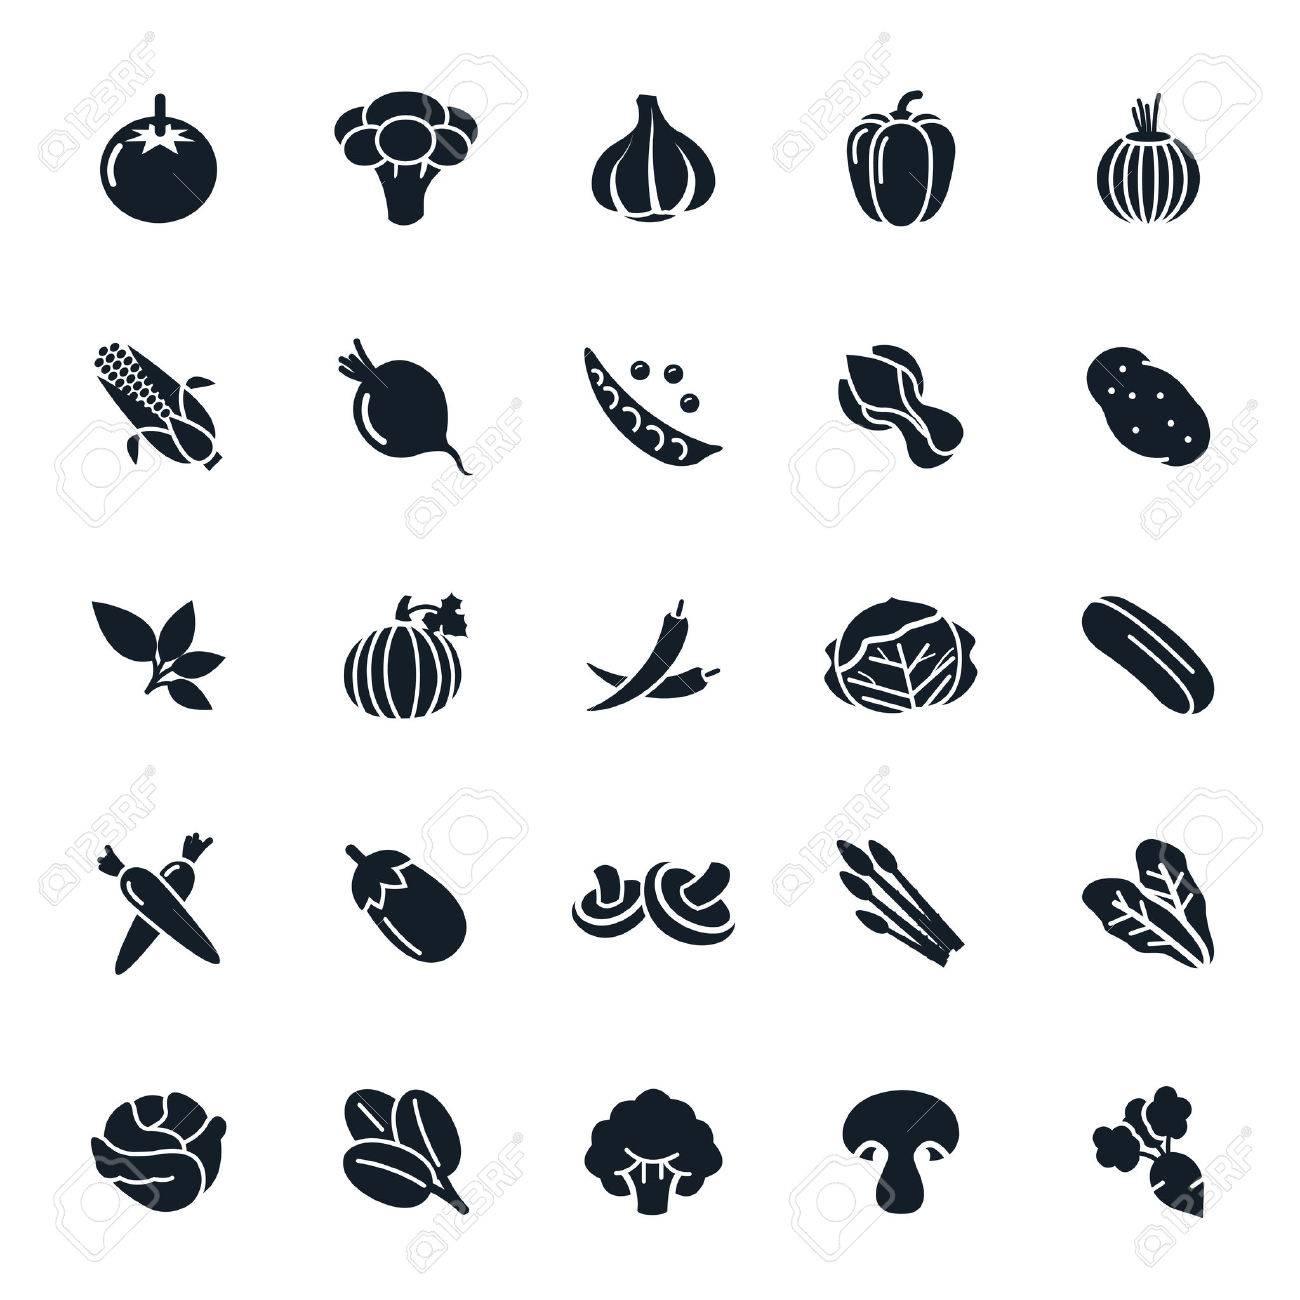 Vegetable icon on White Background illustration - 37919196